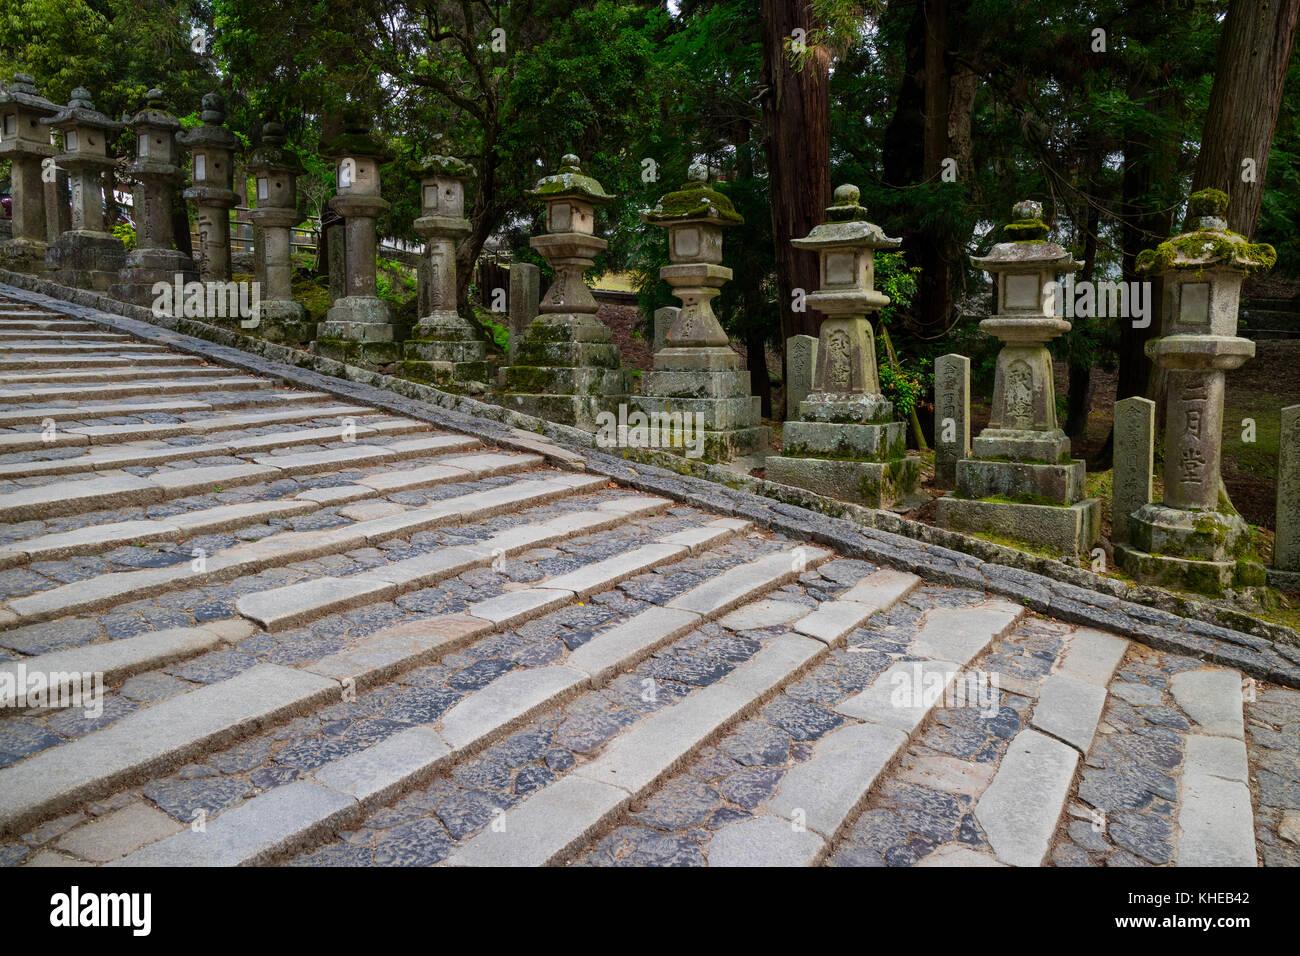 Nara - Japan, May 31, 2017: Row of many stone lanterns that lead up to the Kasuga Taisha shrine - Stock Image